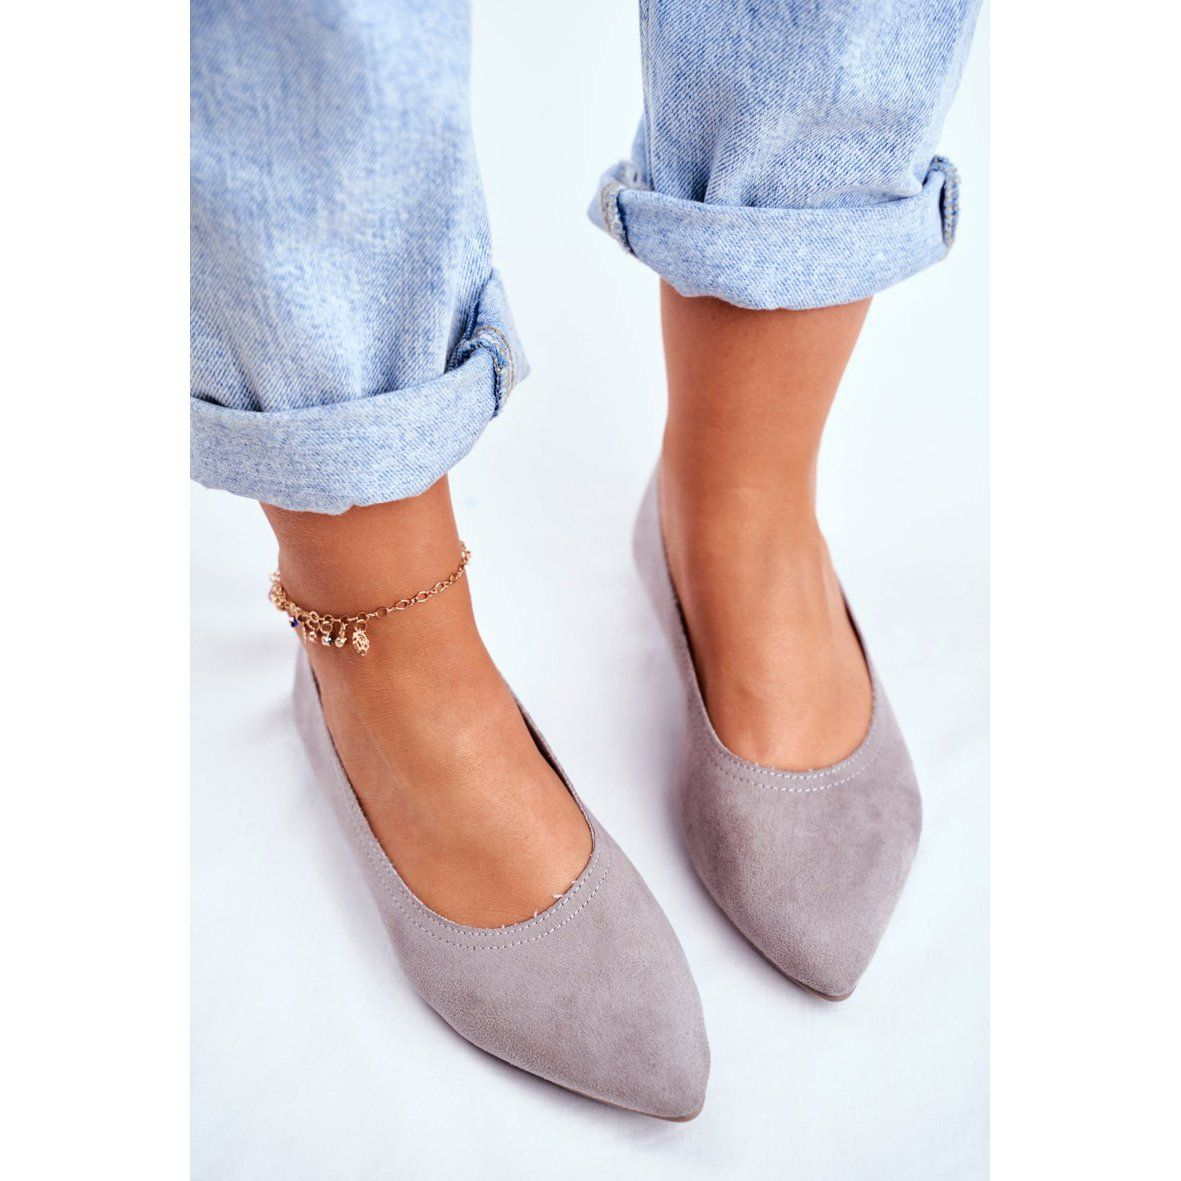 Ps1 Baleriny Damskie Eko Zamsz Szare Bellissima Heeled Mules Shoes Heels